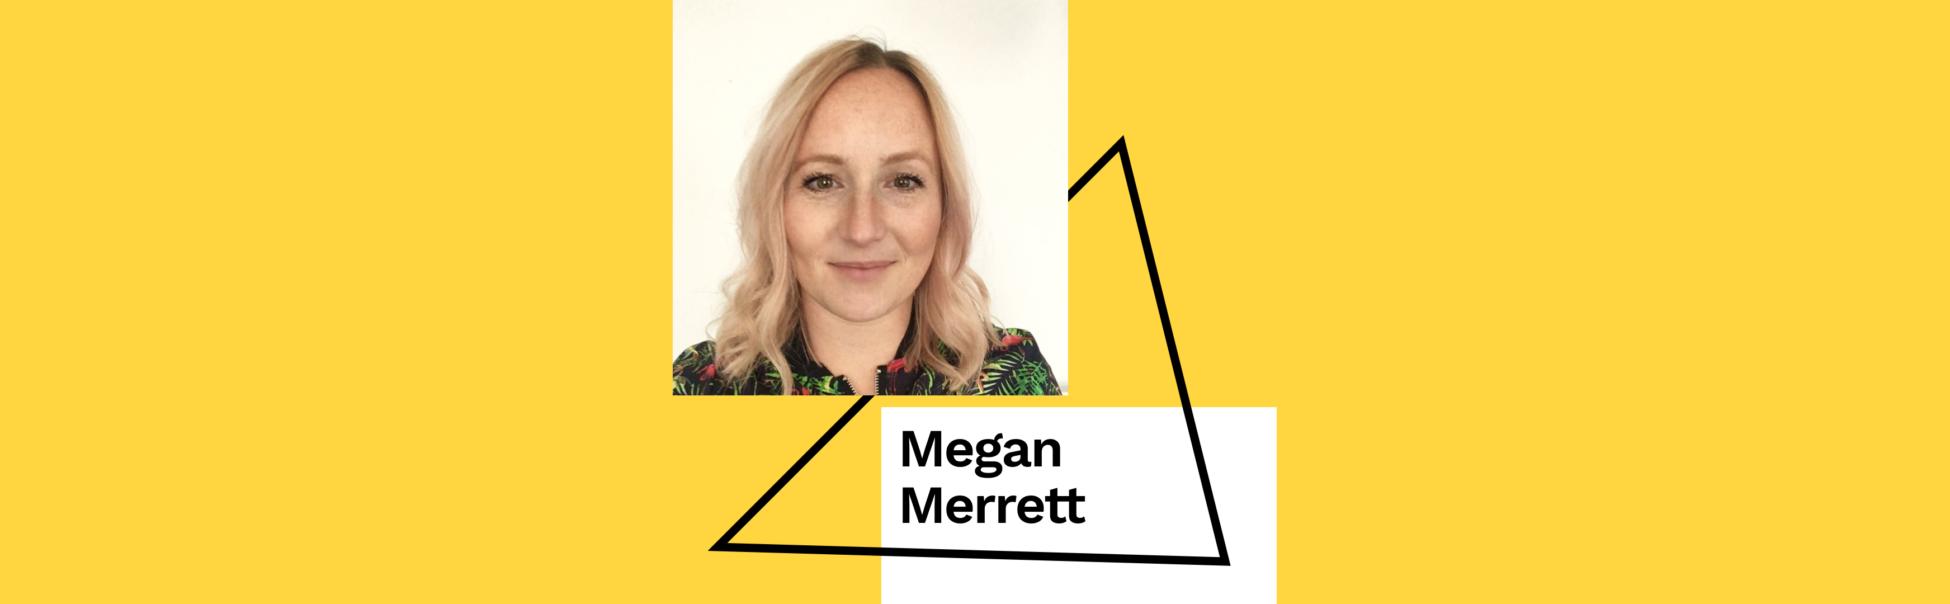 Megan Merrett